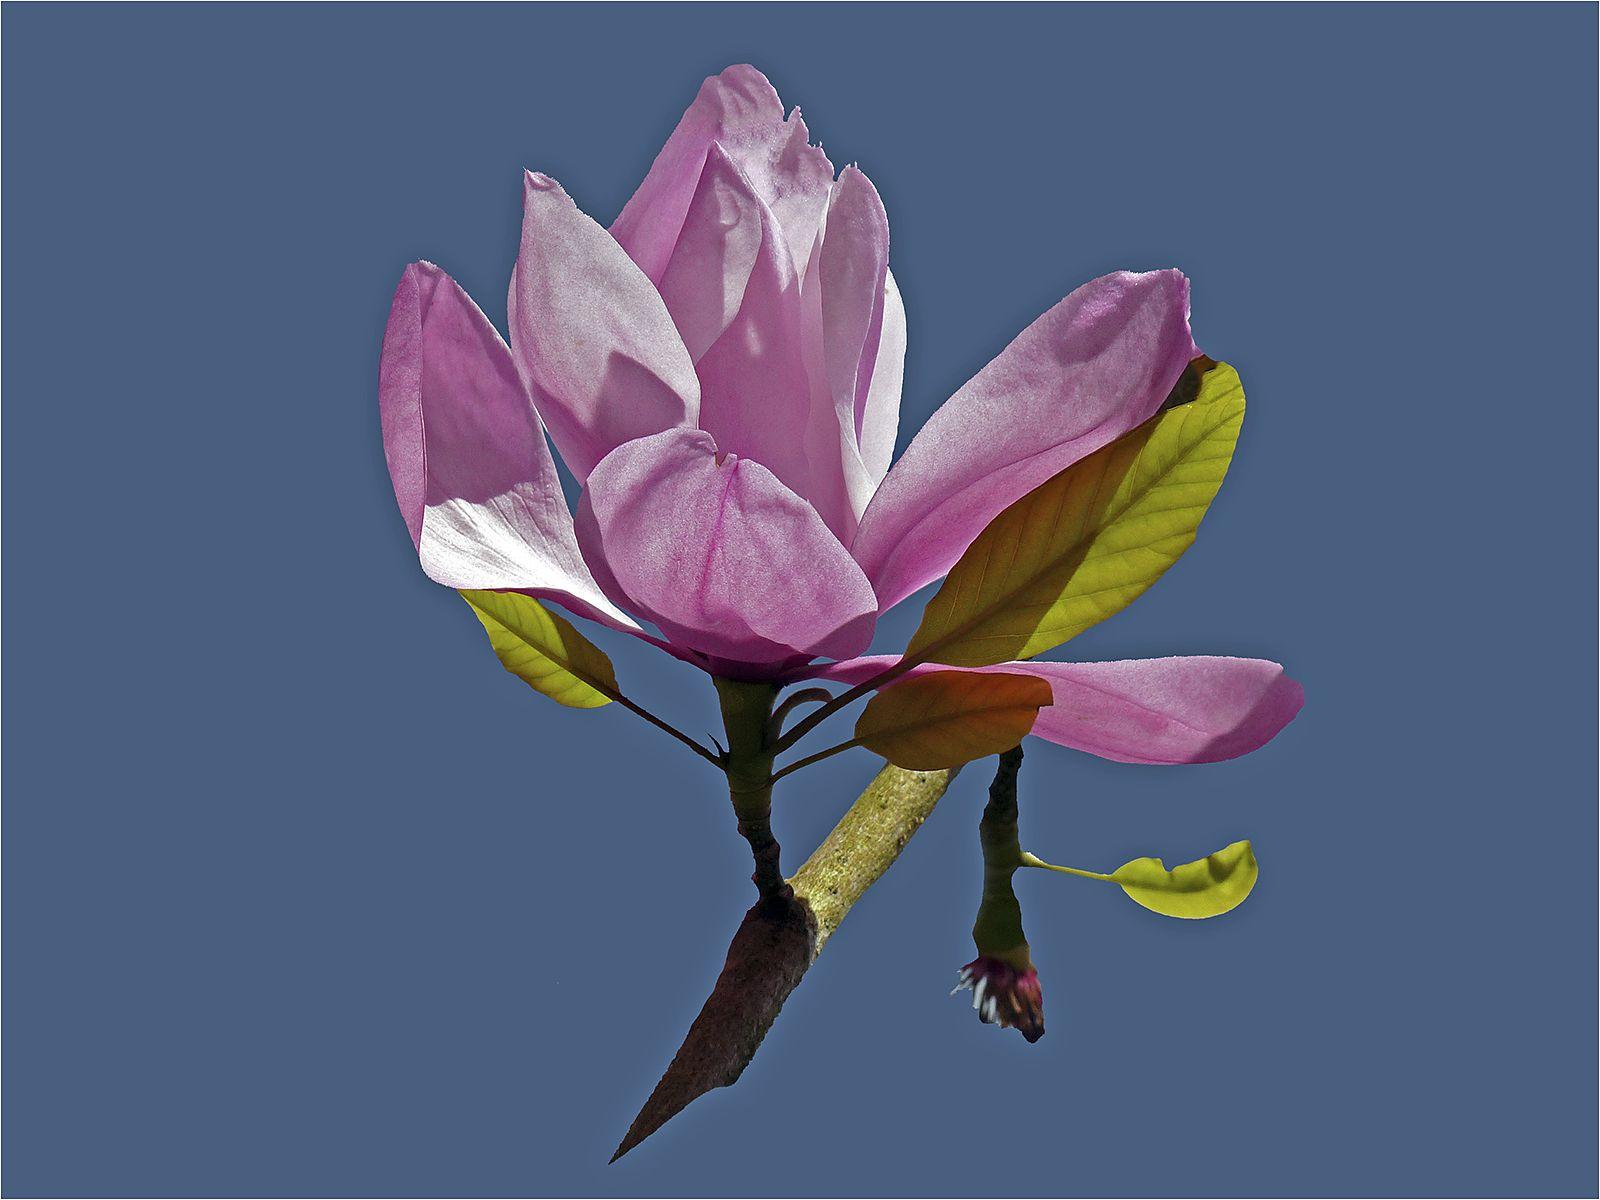 Magnifiecent Magnolia - Carol